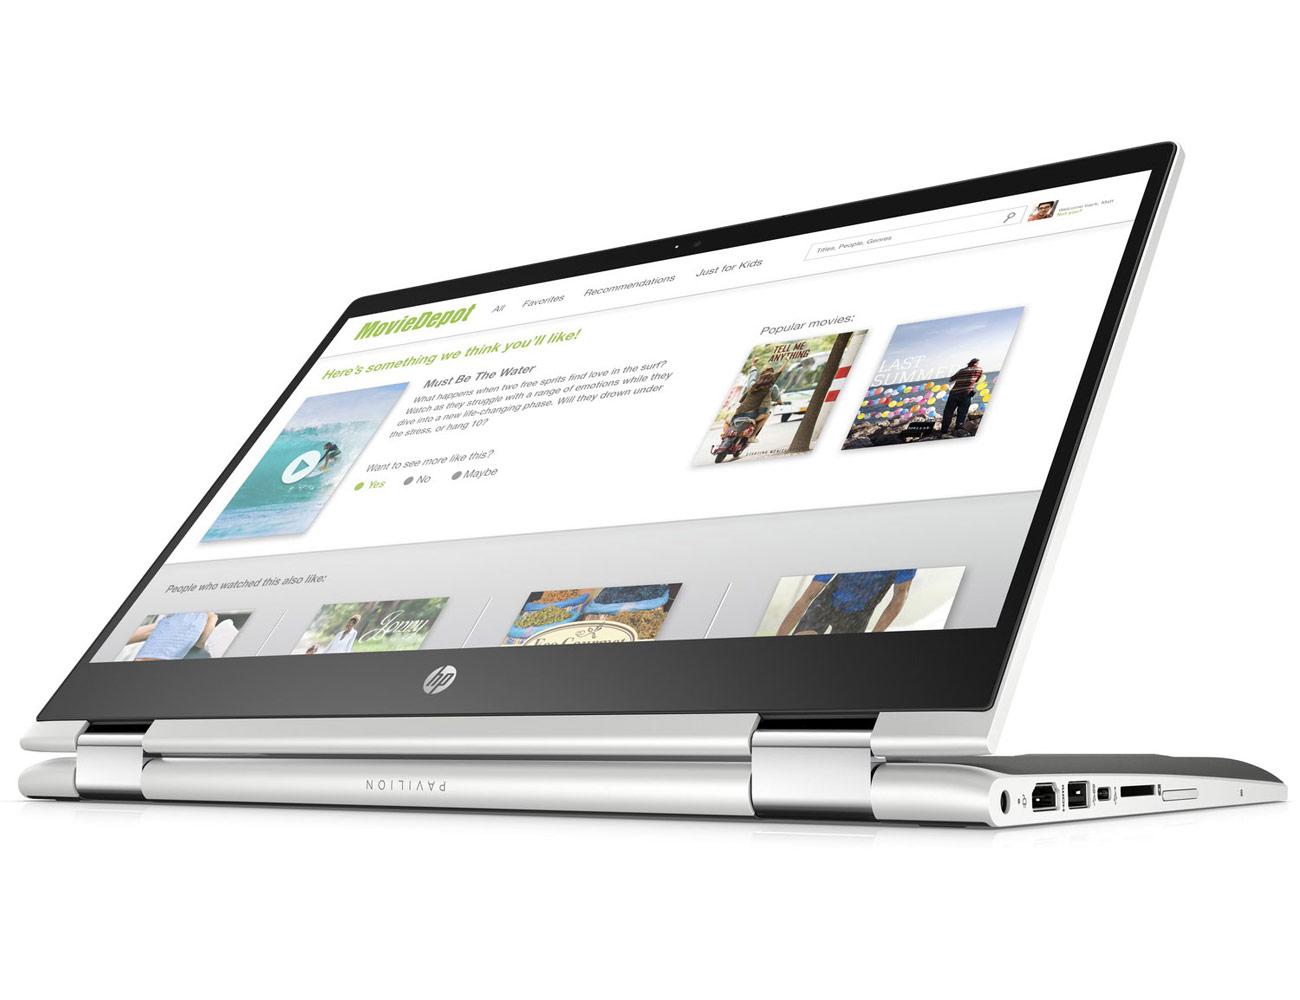 HP_Pavilion_x360_14-cd0037nu-хибриден-лаптоп